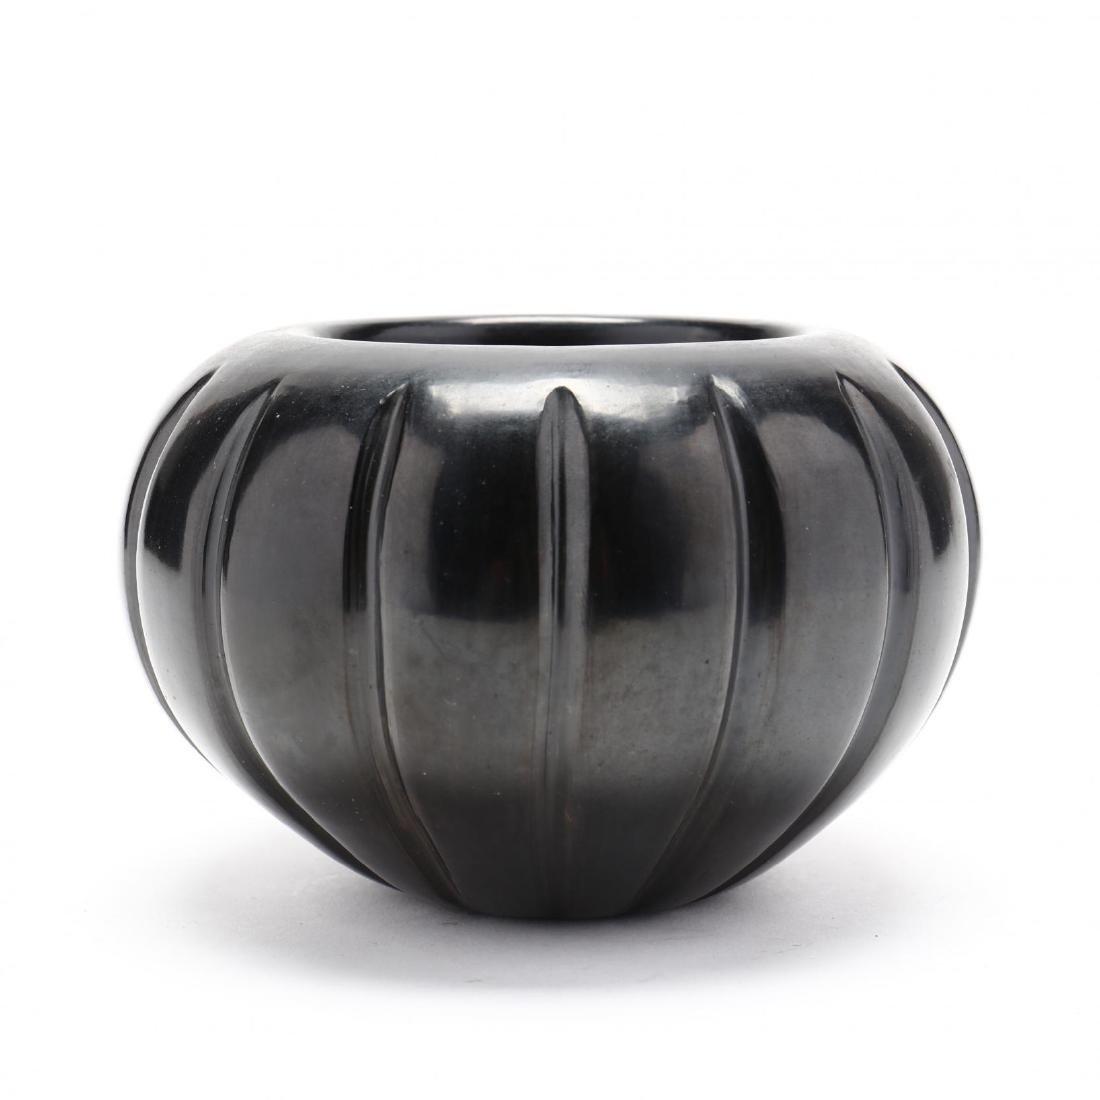 Angela Baca, Santa Clara, 1927-2014), Blackware Melon